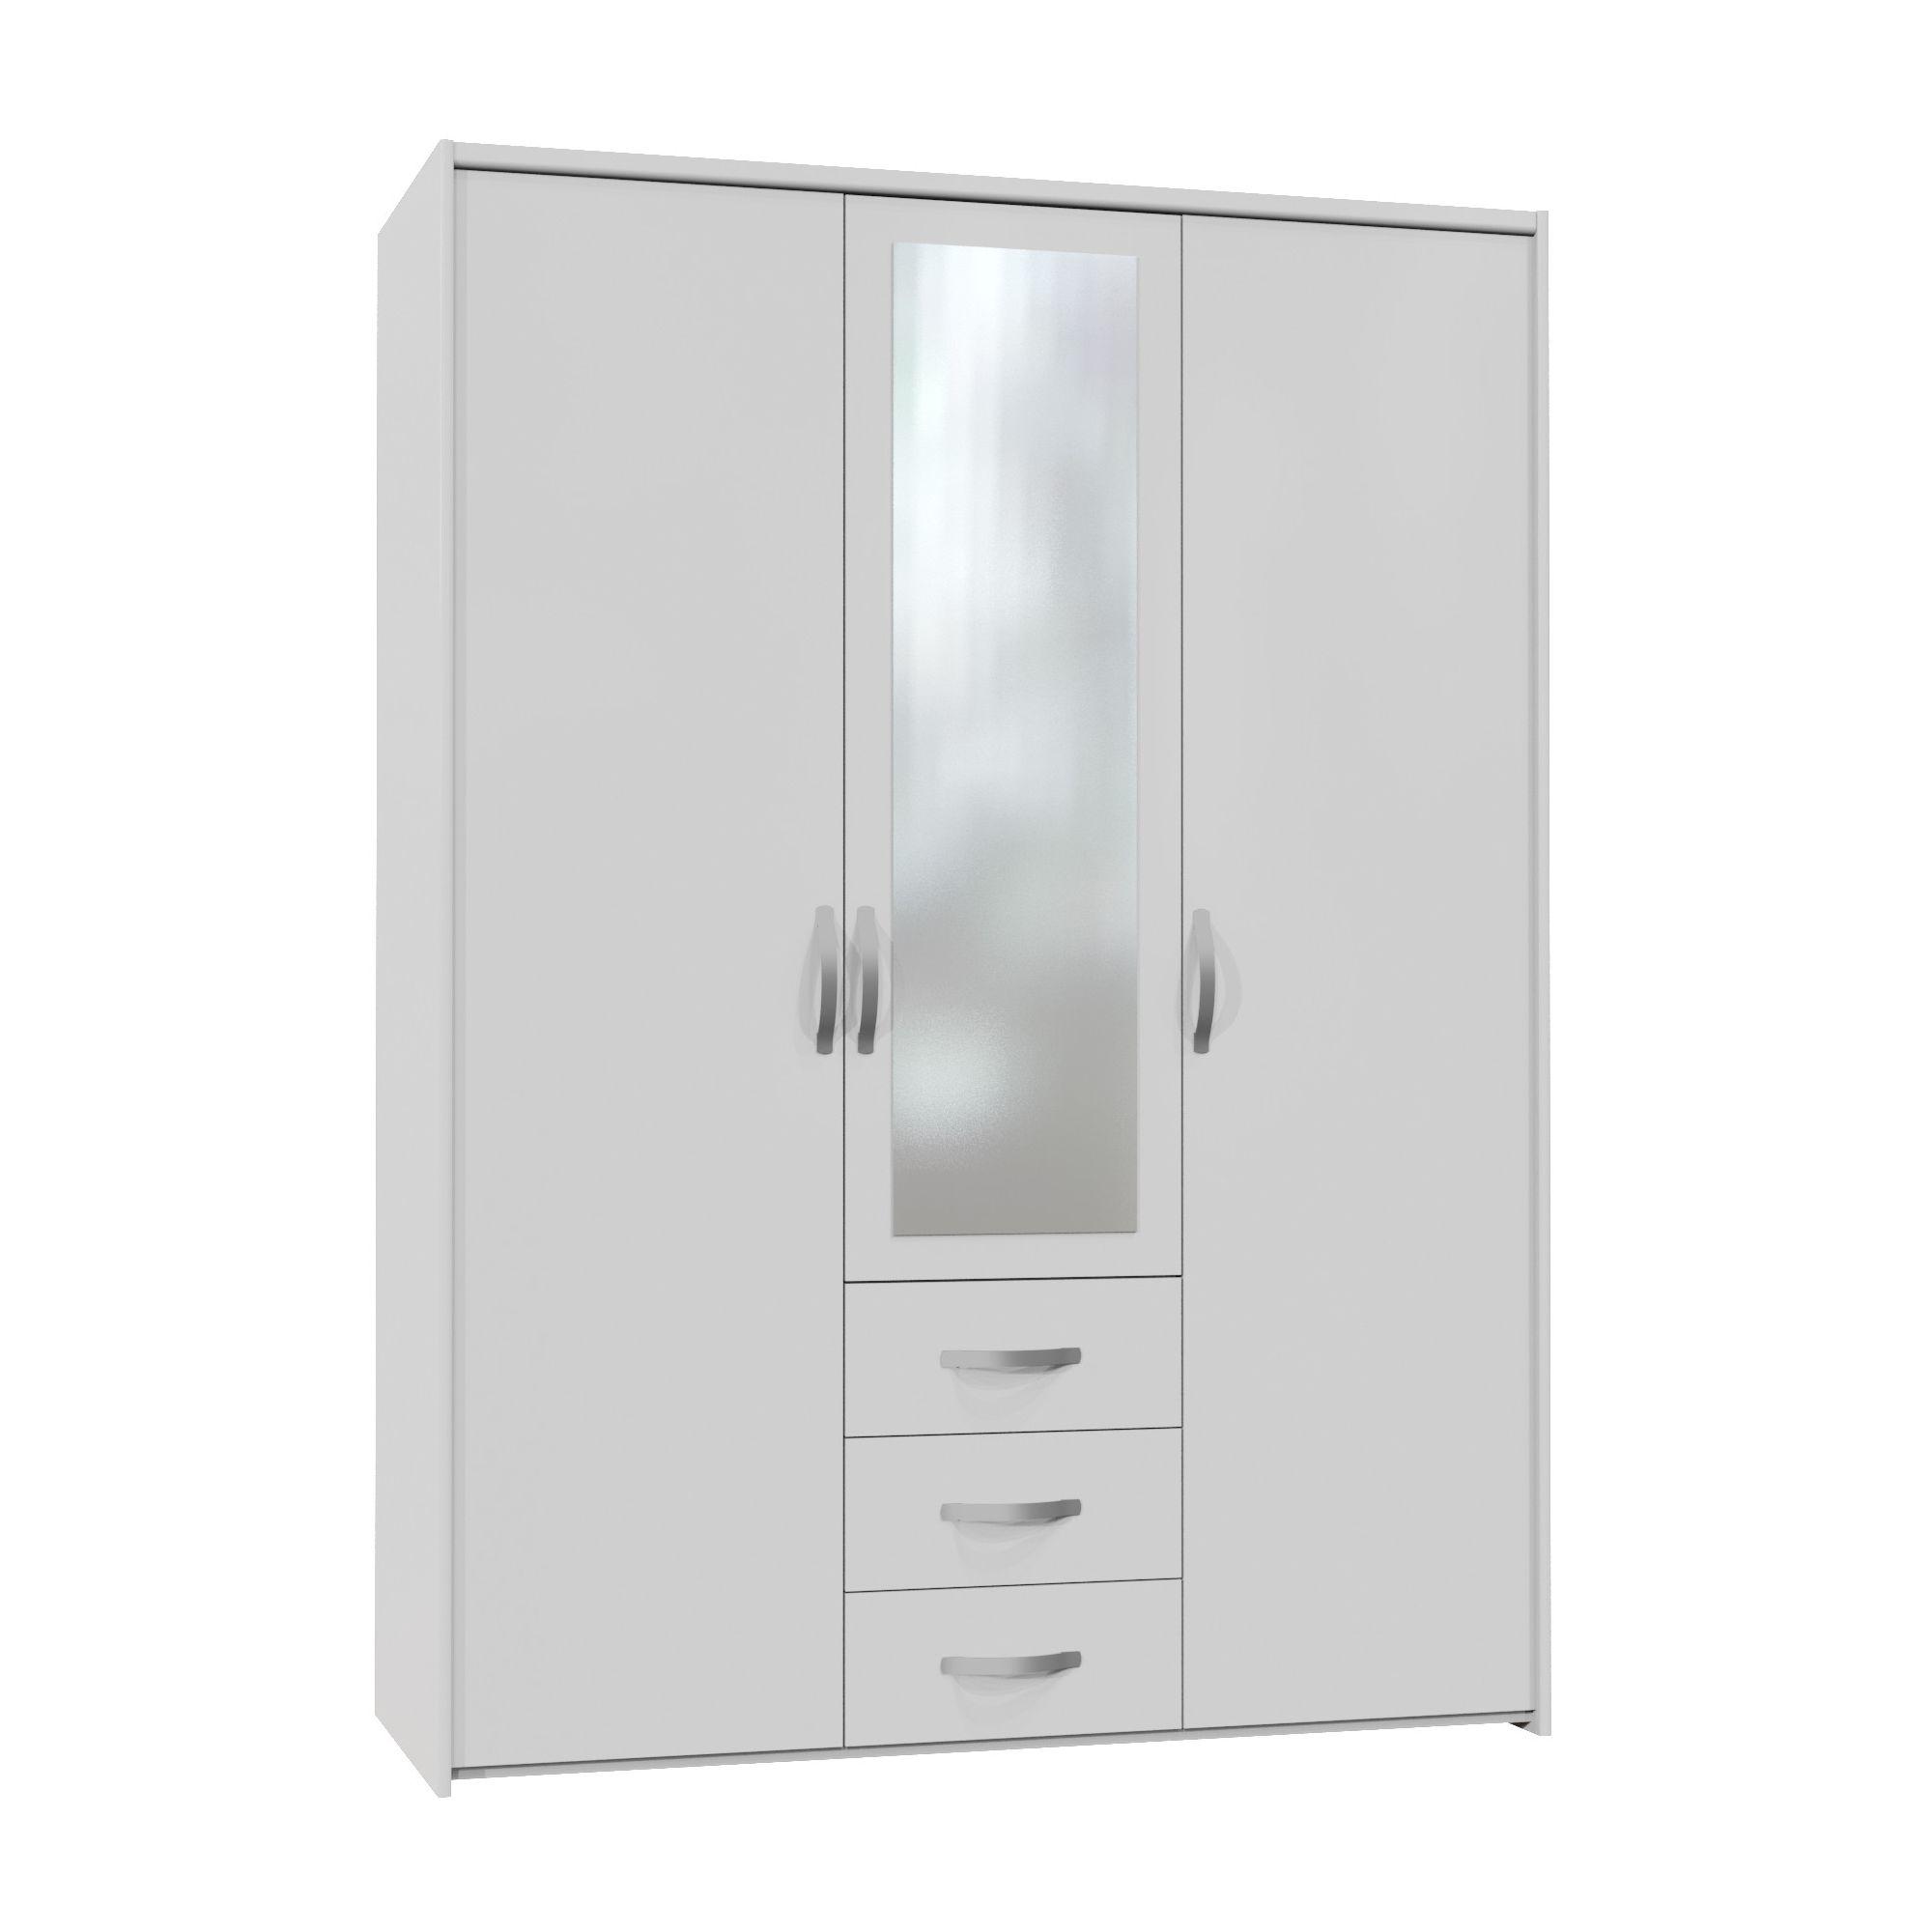 Altruna Now 3 Doors Wardrobe - White at Tesco Direct